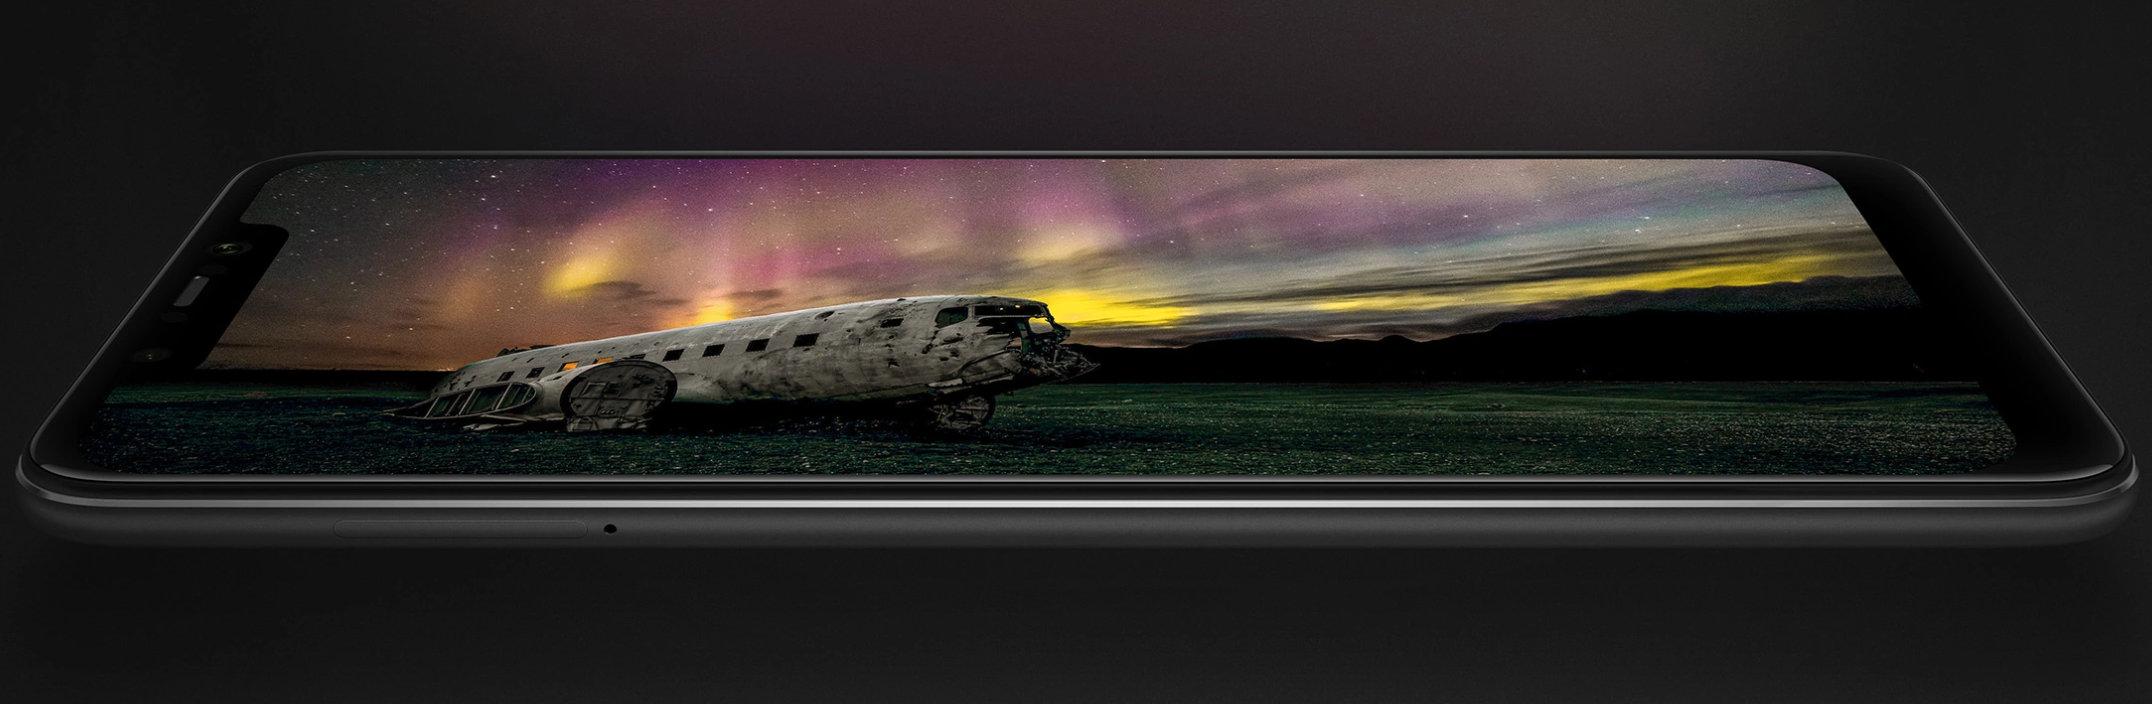 Xiaomi POCOPHONE F1 llega a España esta misma semana 29